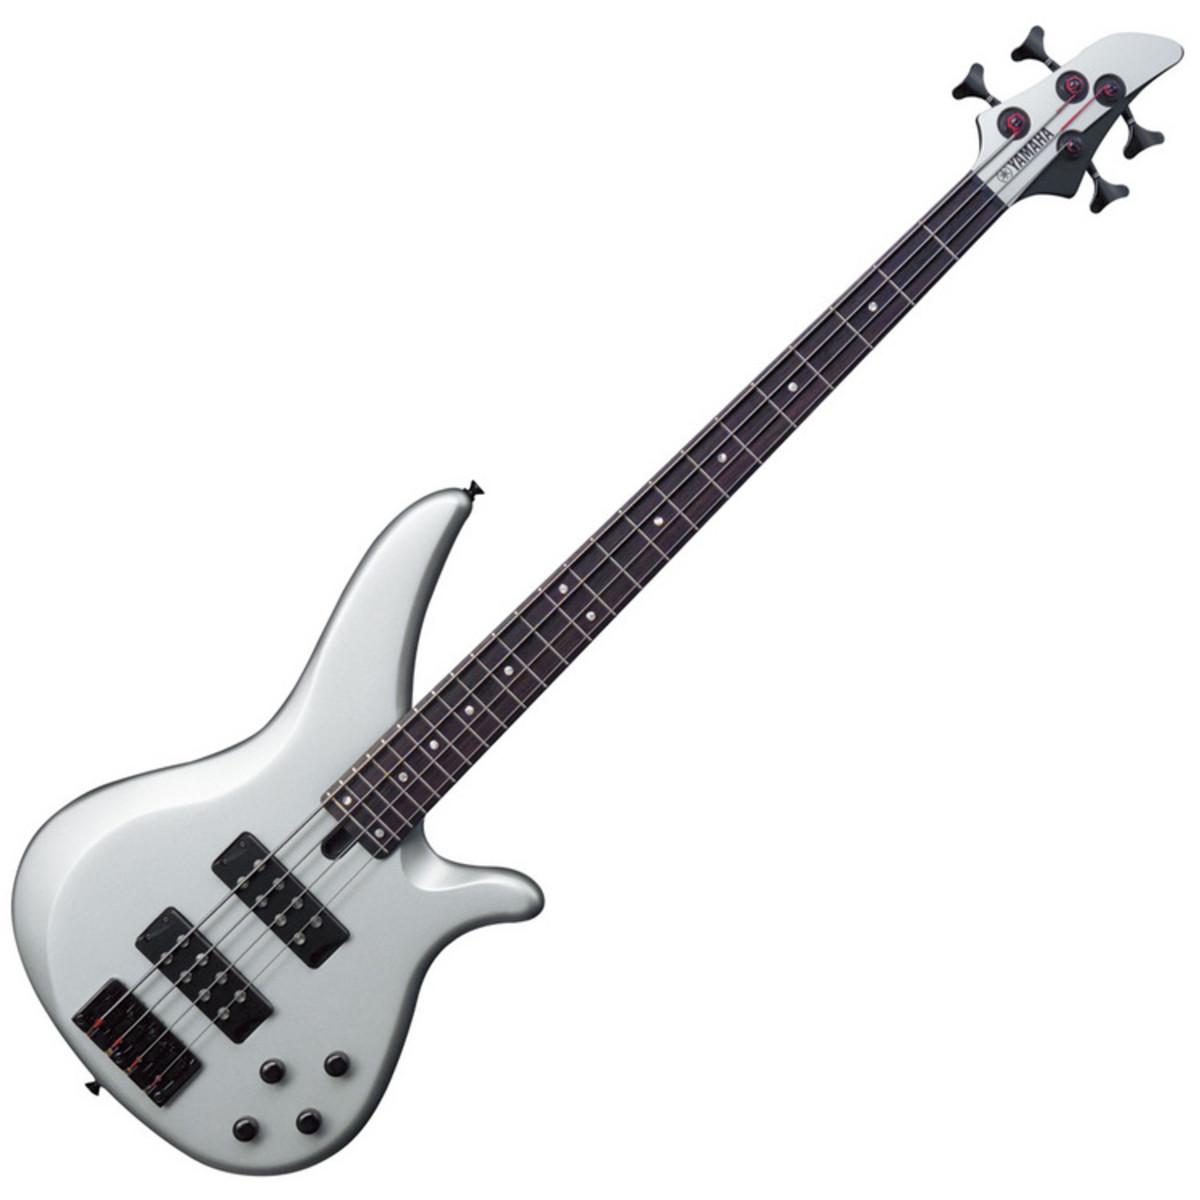 disc yamaha rbx374 bass guitar flat silver at. Black Bedroom Furniture Sets. Home Design Ideas